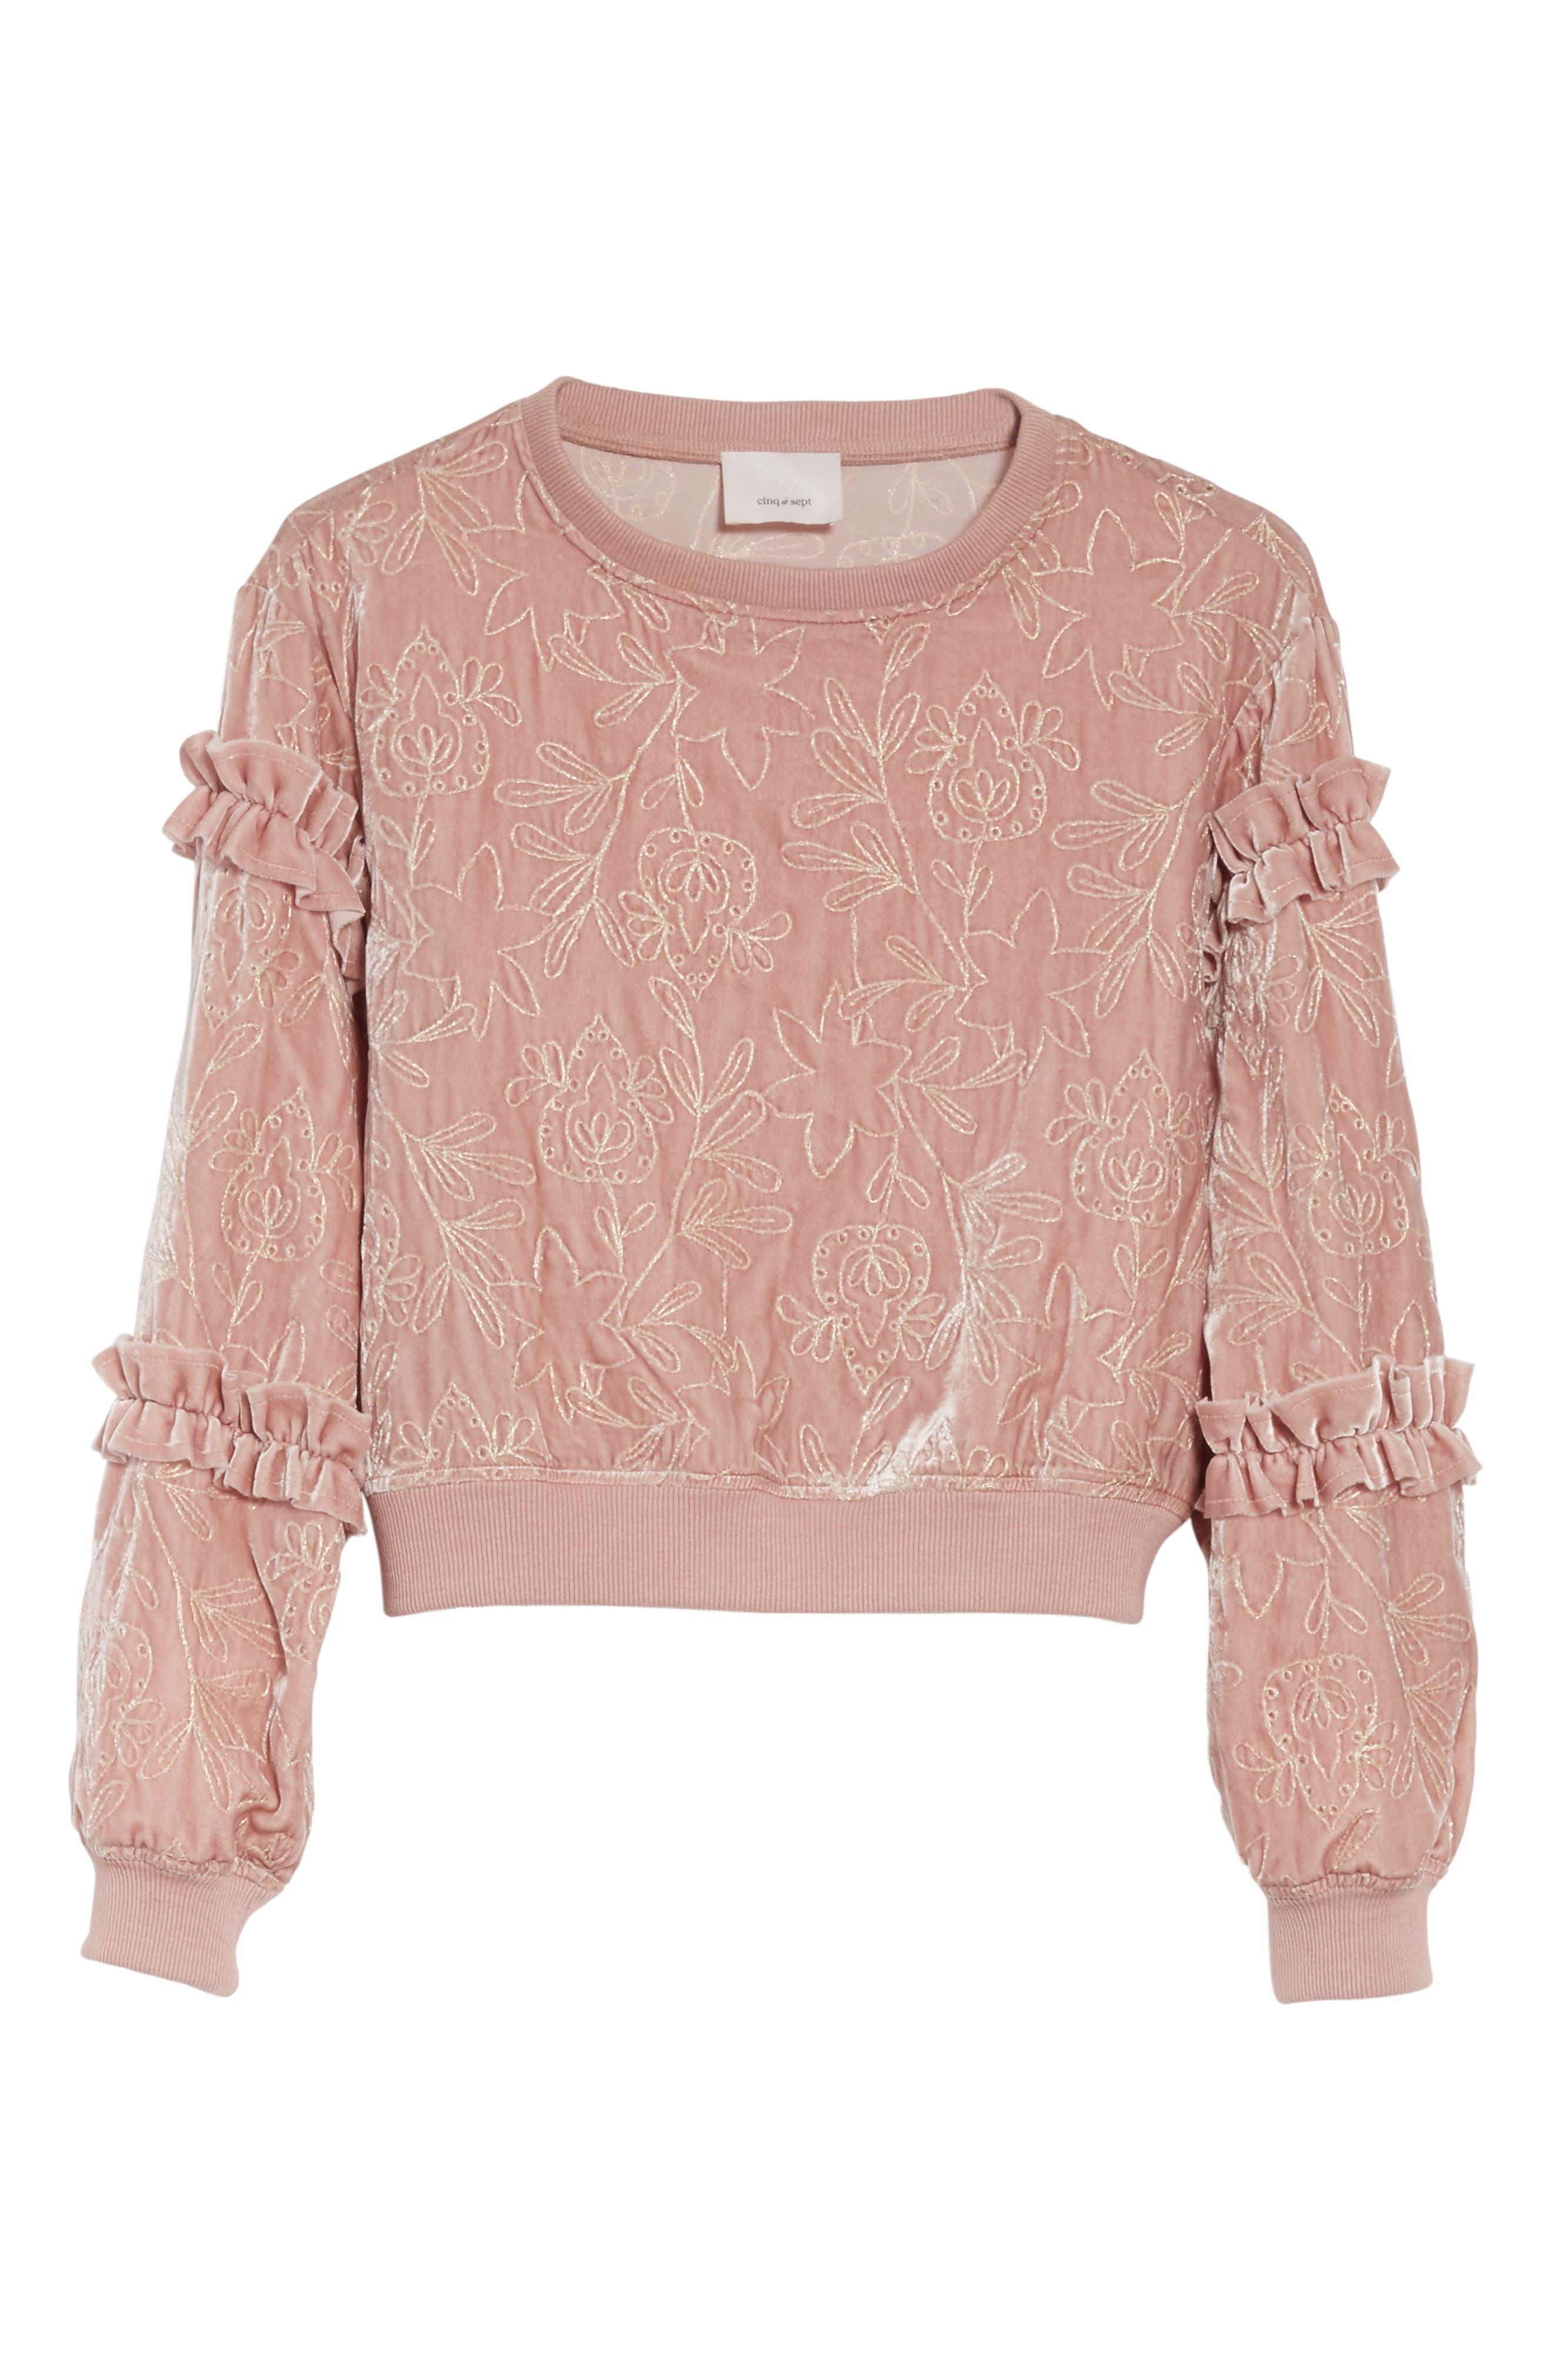 Nara Embroidered Velvet Sweatshirt,                             Alternate thumbnail 6, color,                             Mauve